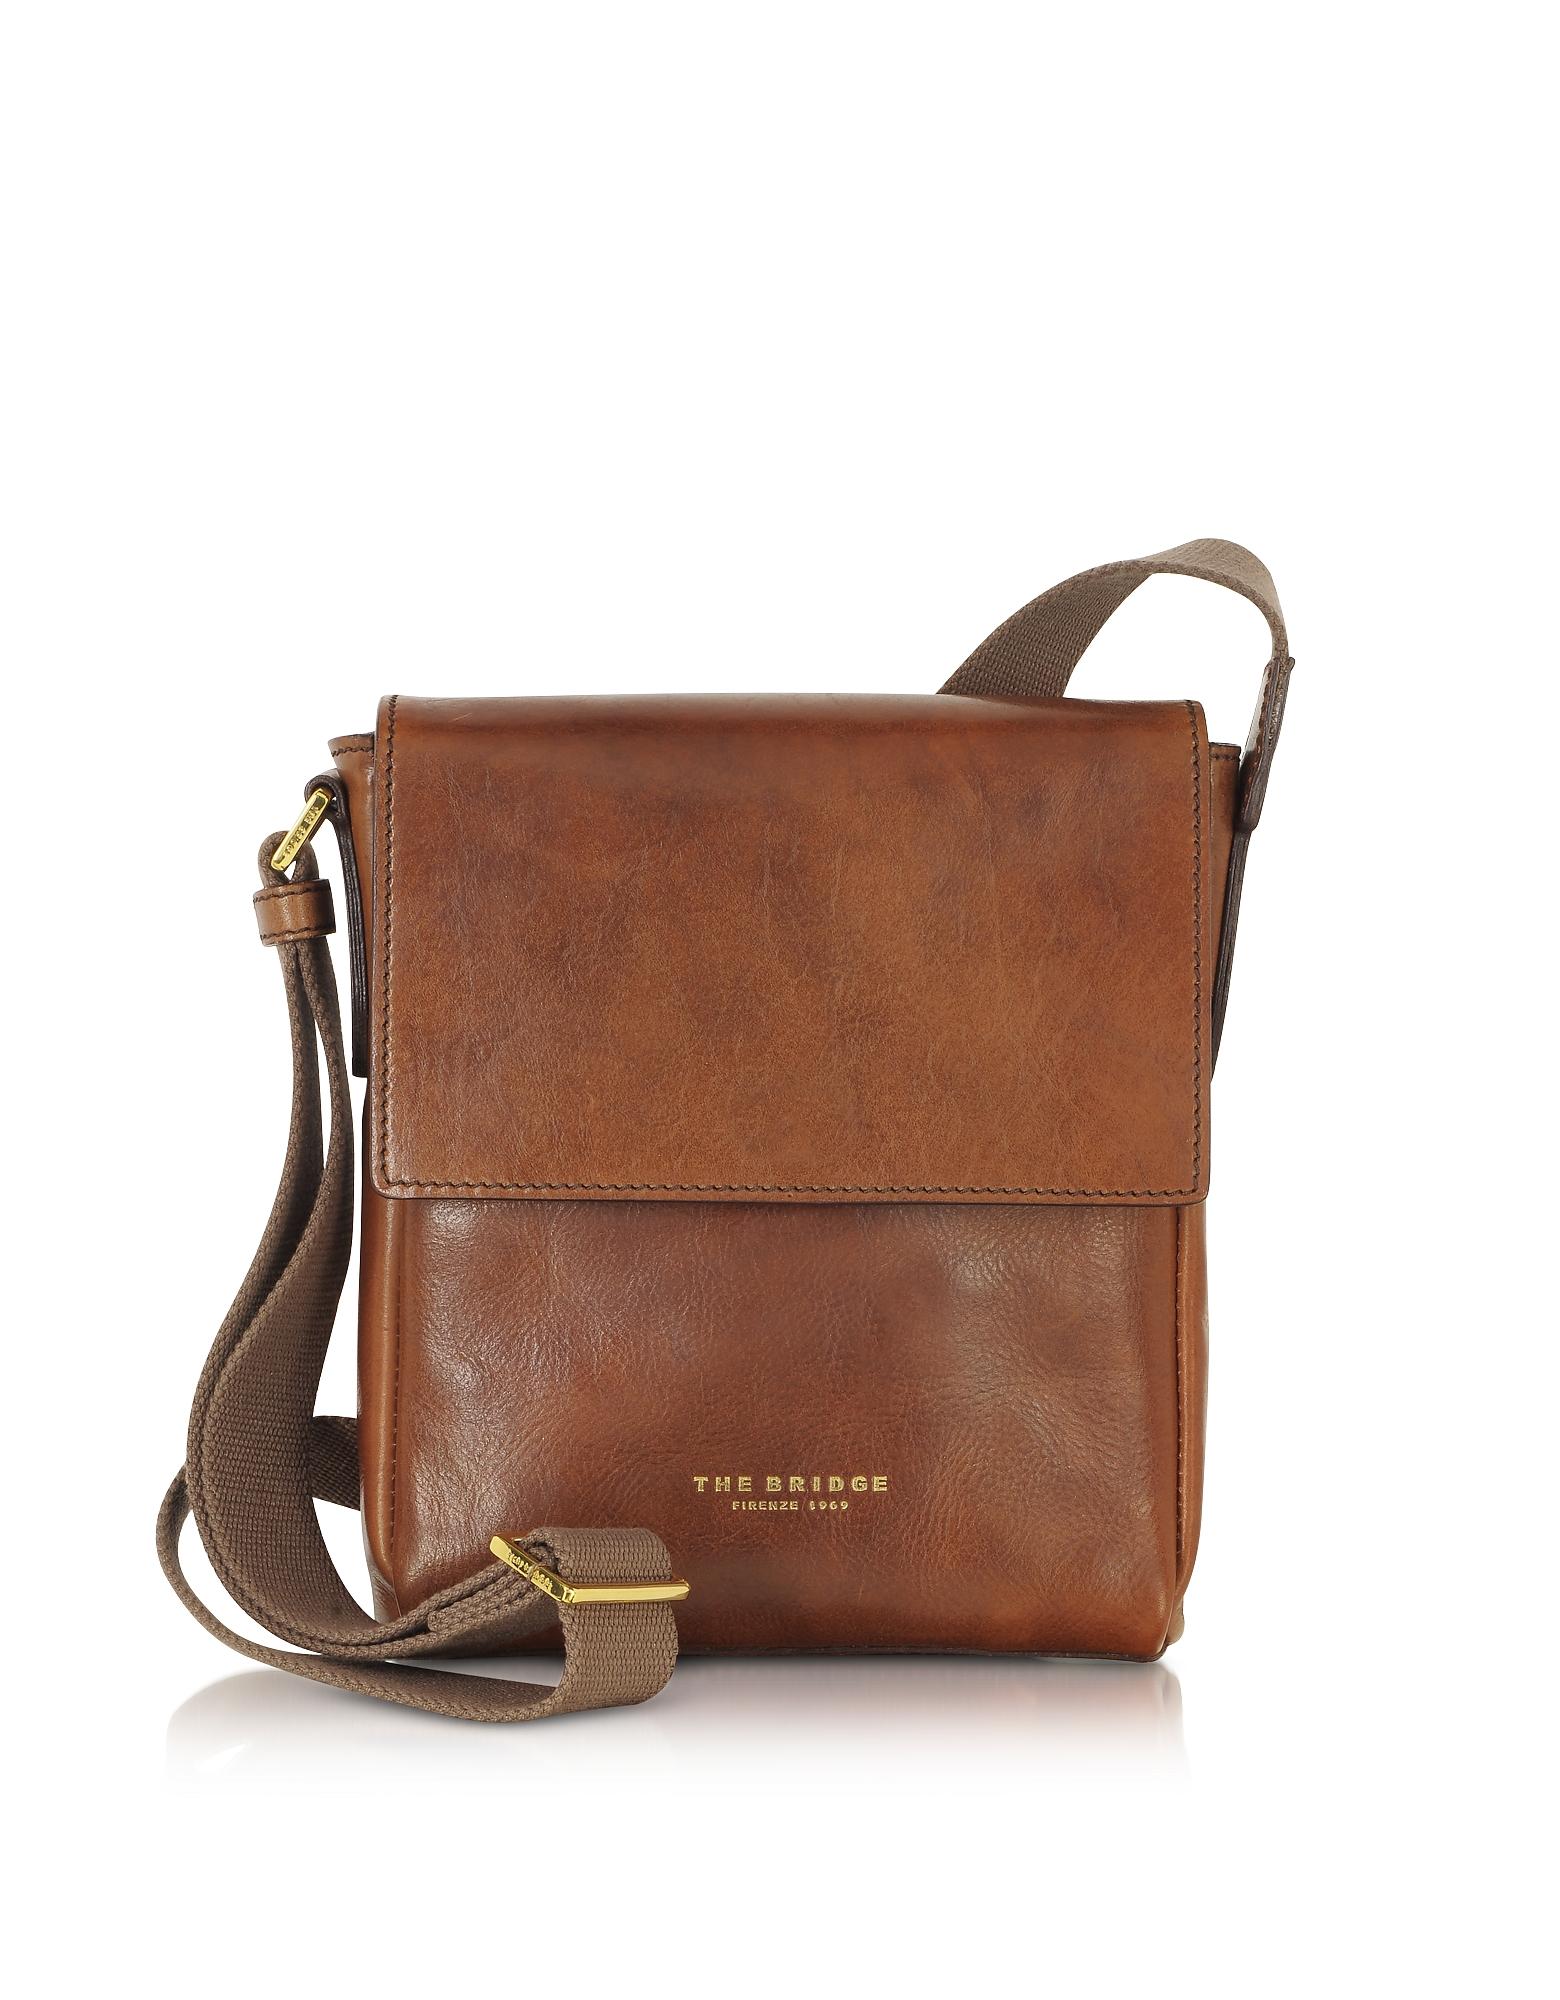 The Bridge Designer Men's Bags,  Sfoderata Marrone Leather Men's Crossbody Bag